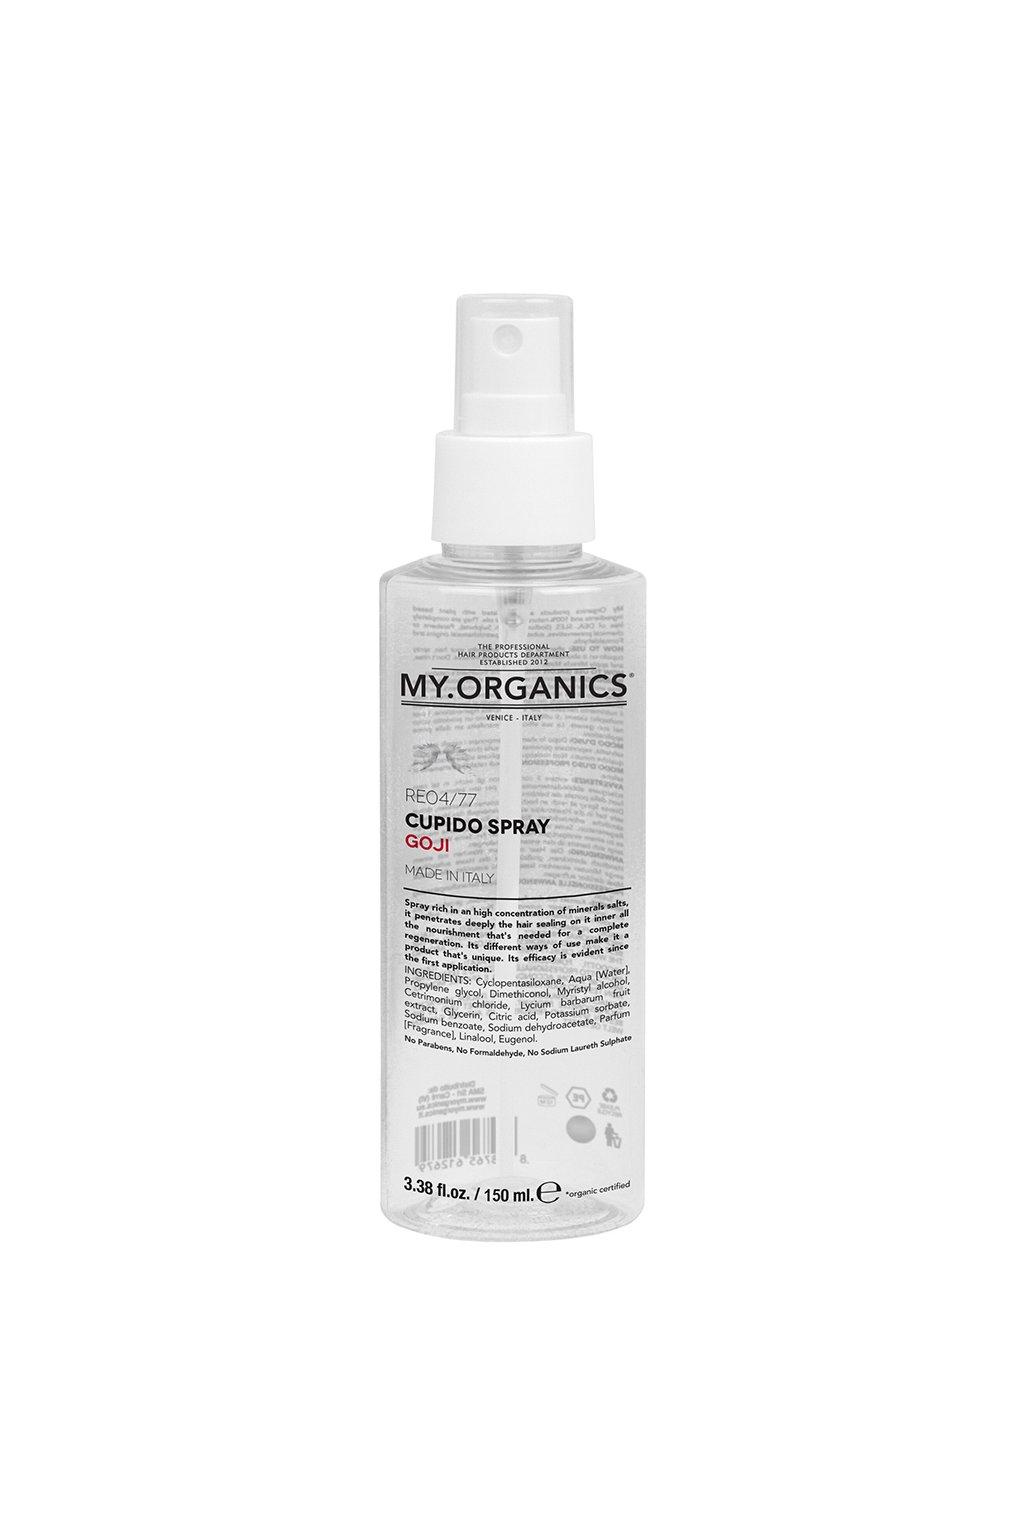 my organics cupido spray goji 150ml